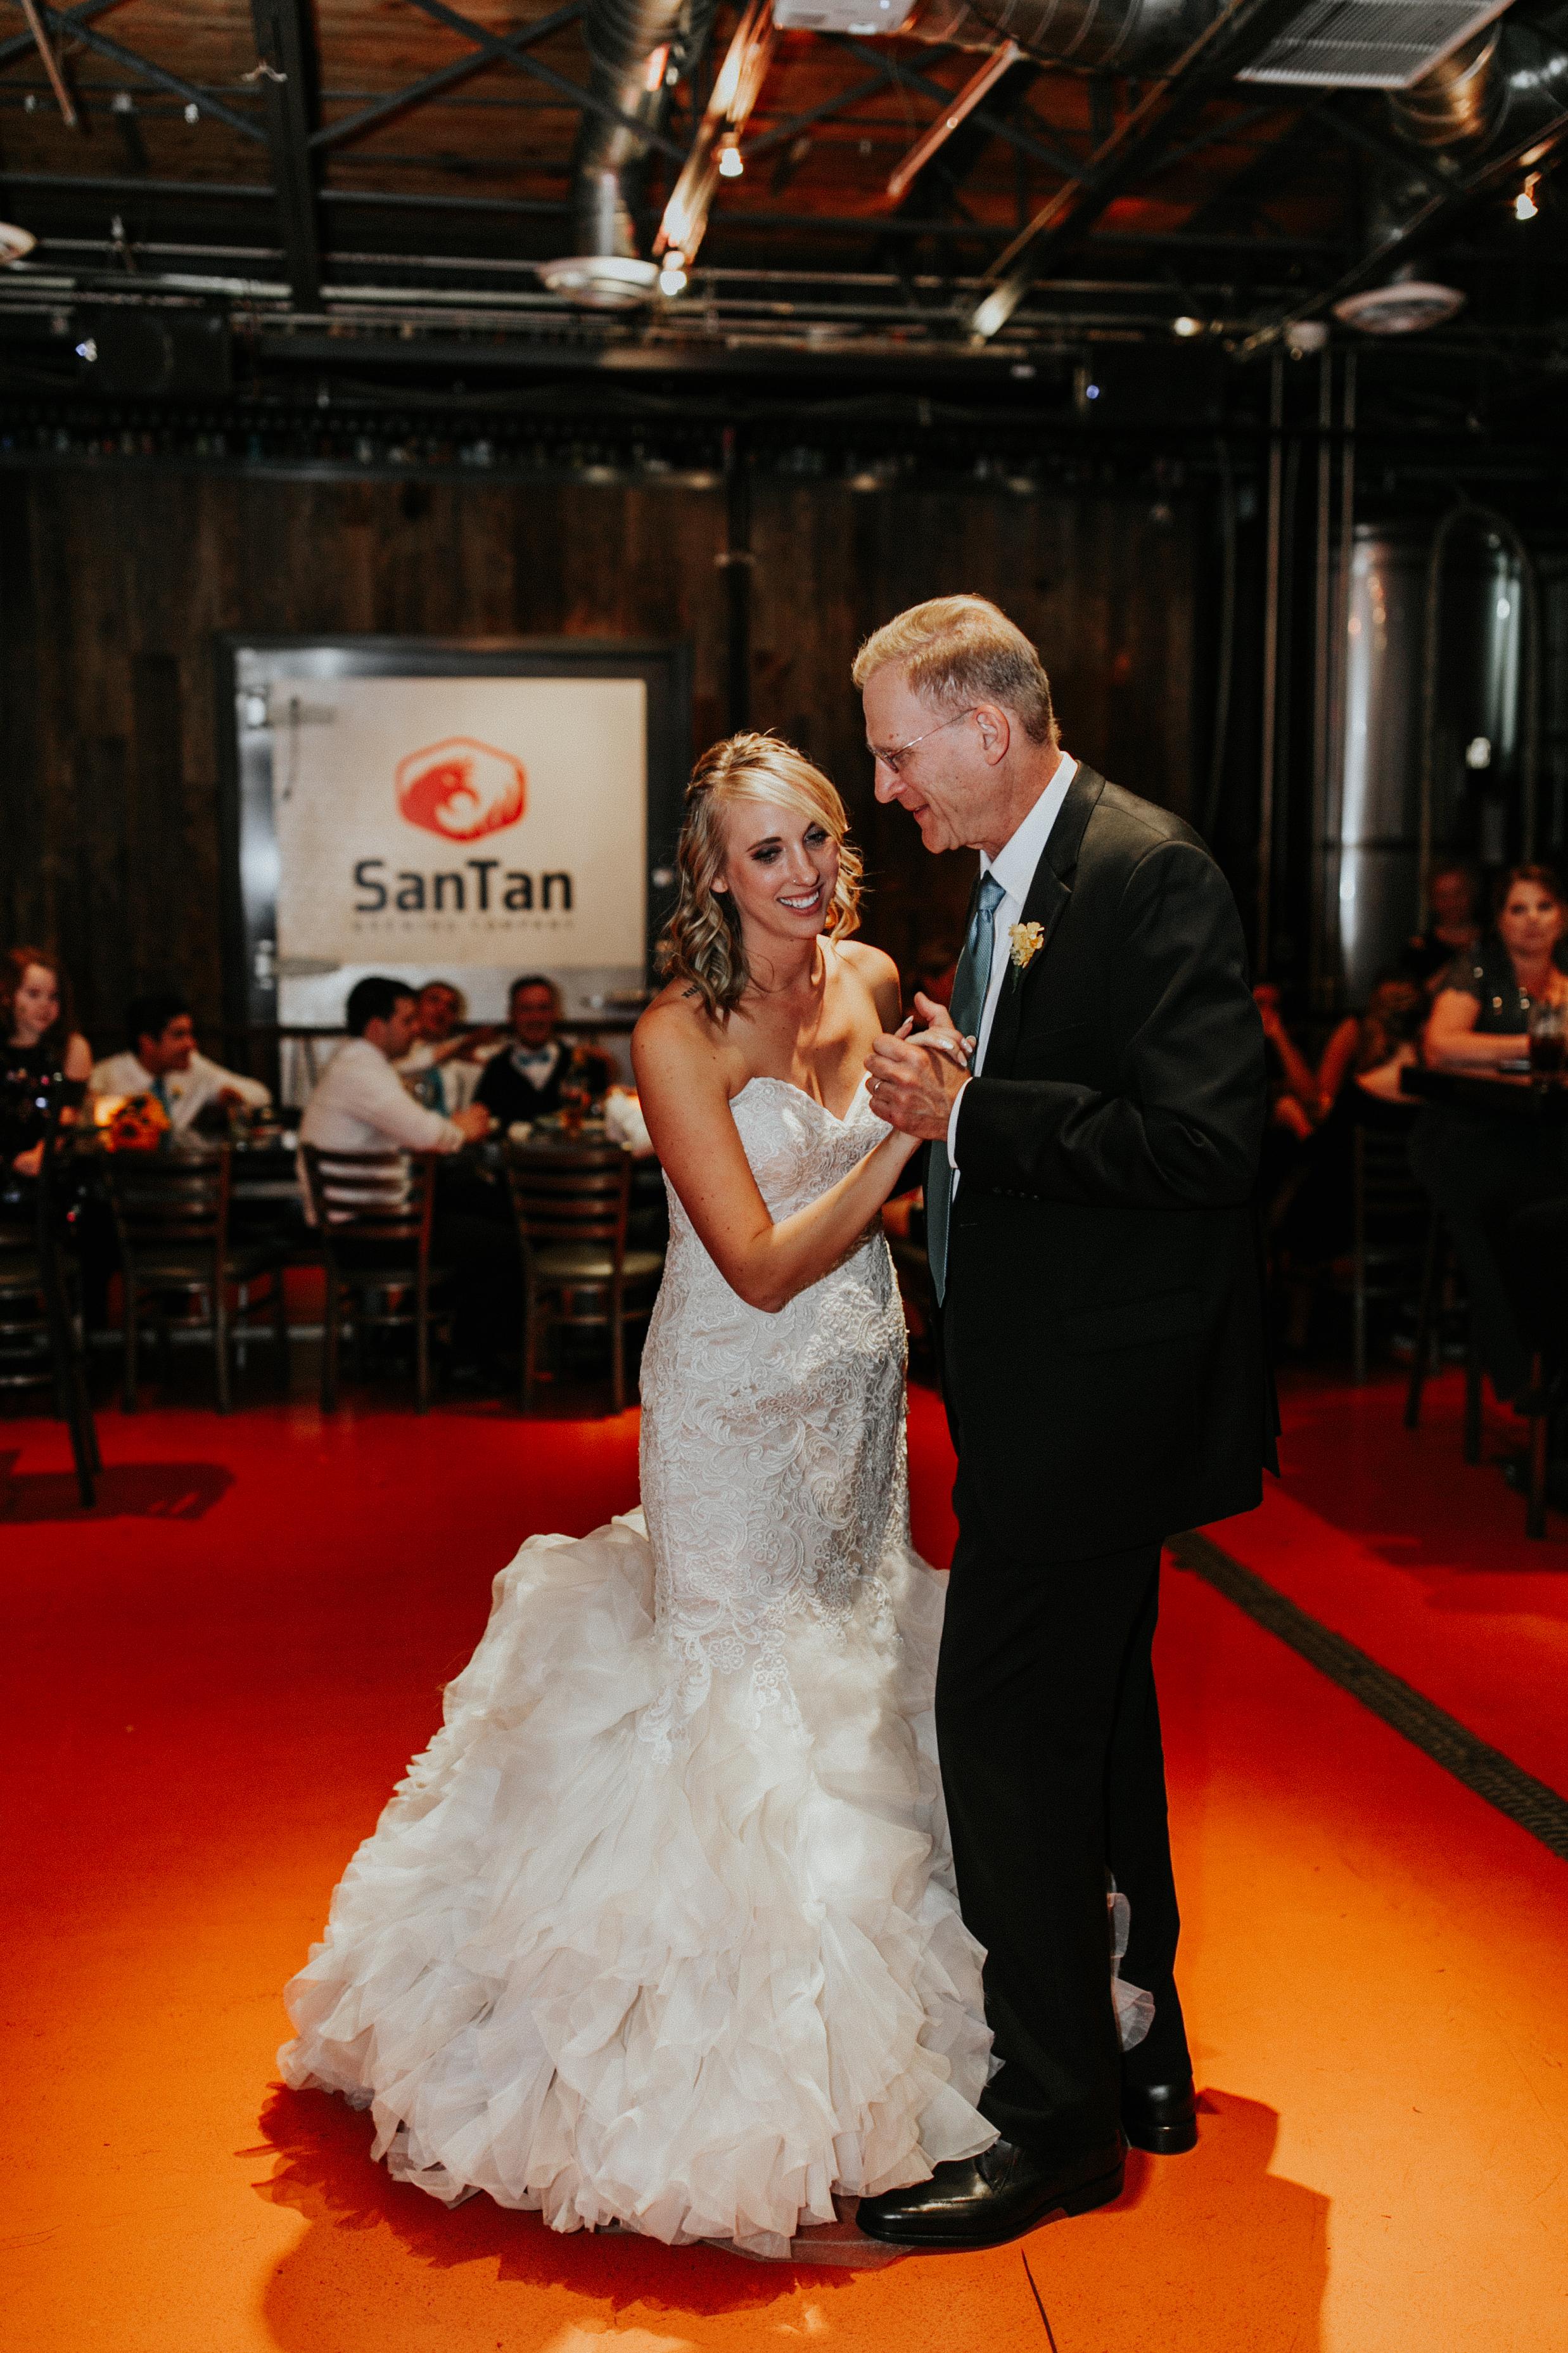 adventure-wedding-photographer-gracetphotography-54.jpg